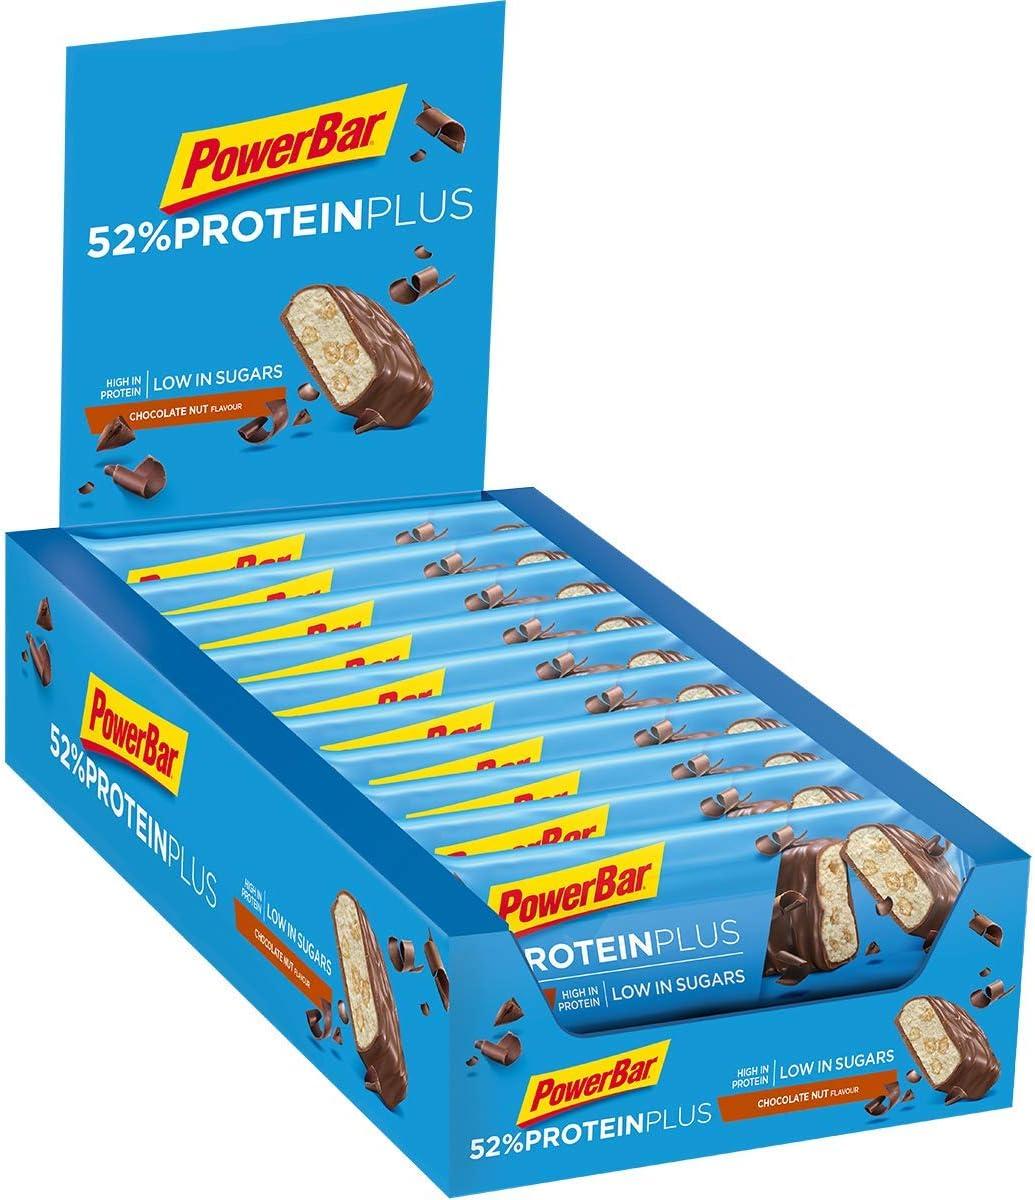 PowerBar Protein Plus 52% Cookies&Cream 20x50g - Barras de Proteína con Bajo Contenido de Azúcar